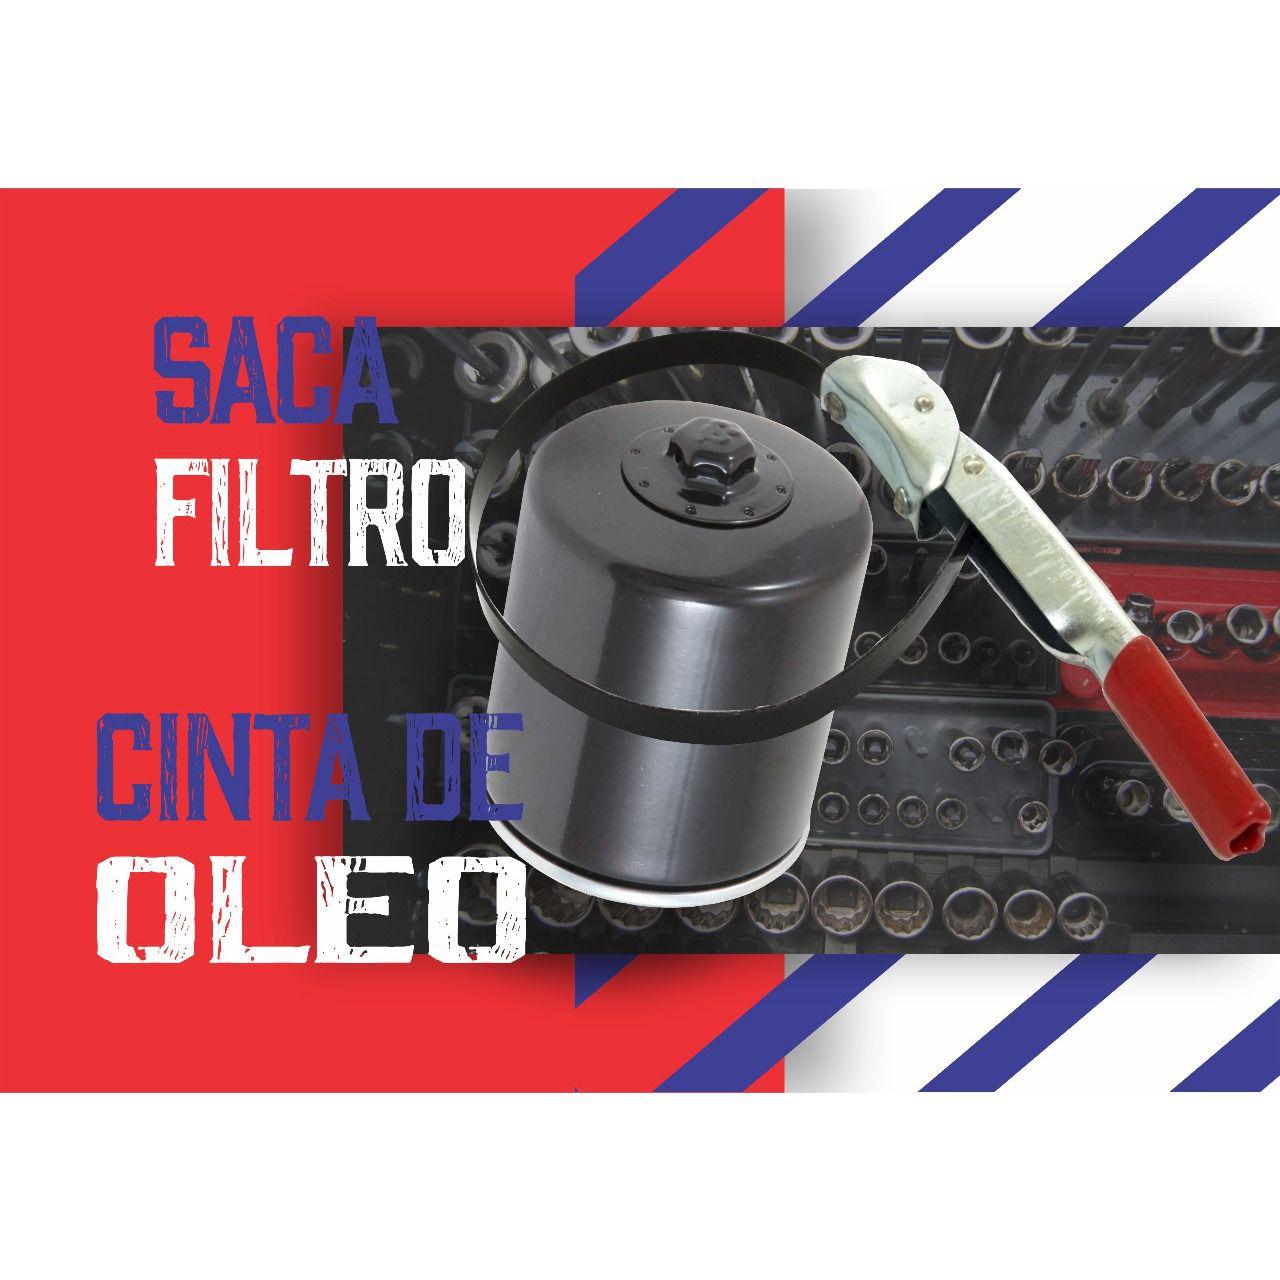 Chave Saca Filtro Cinta De Óleo  Volkswagem,Ford 85 x 96MM -  - Rea Comércio - Sua Loja Completa!